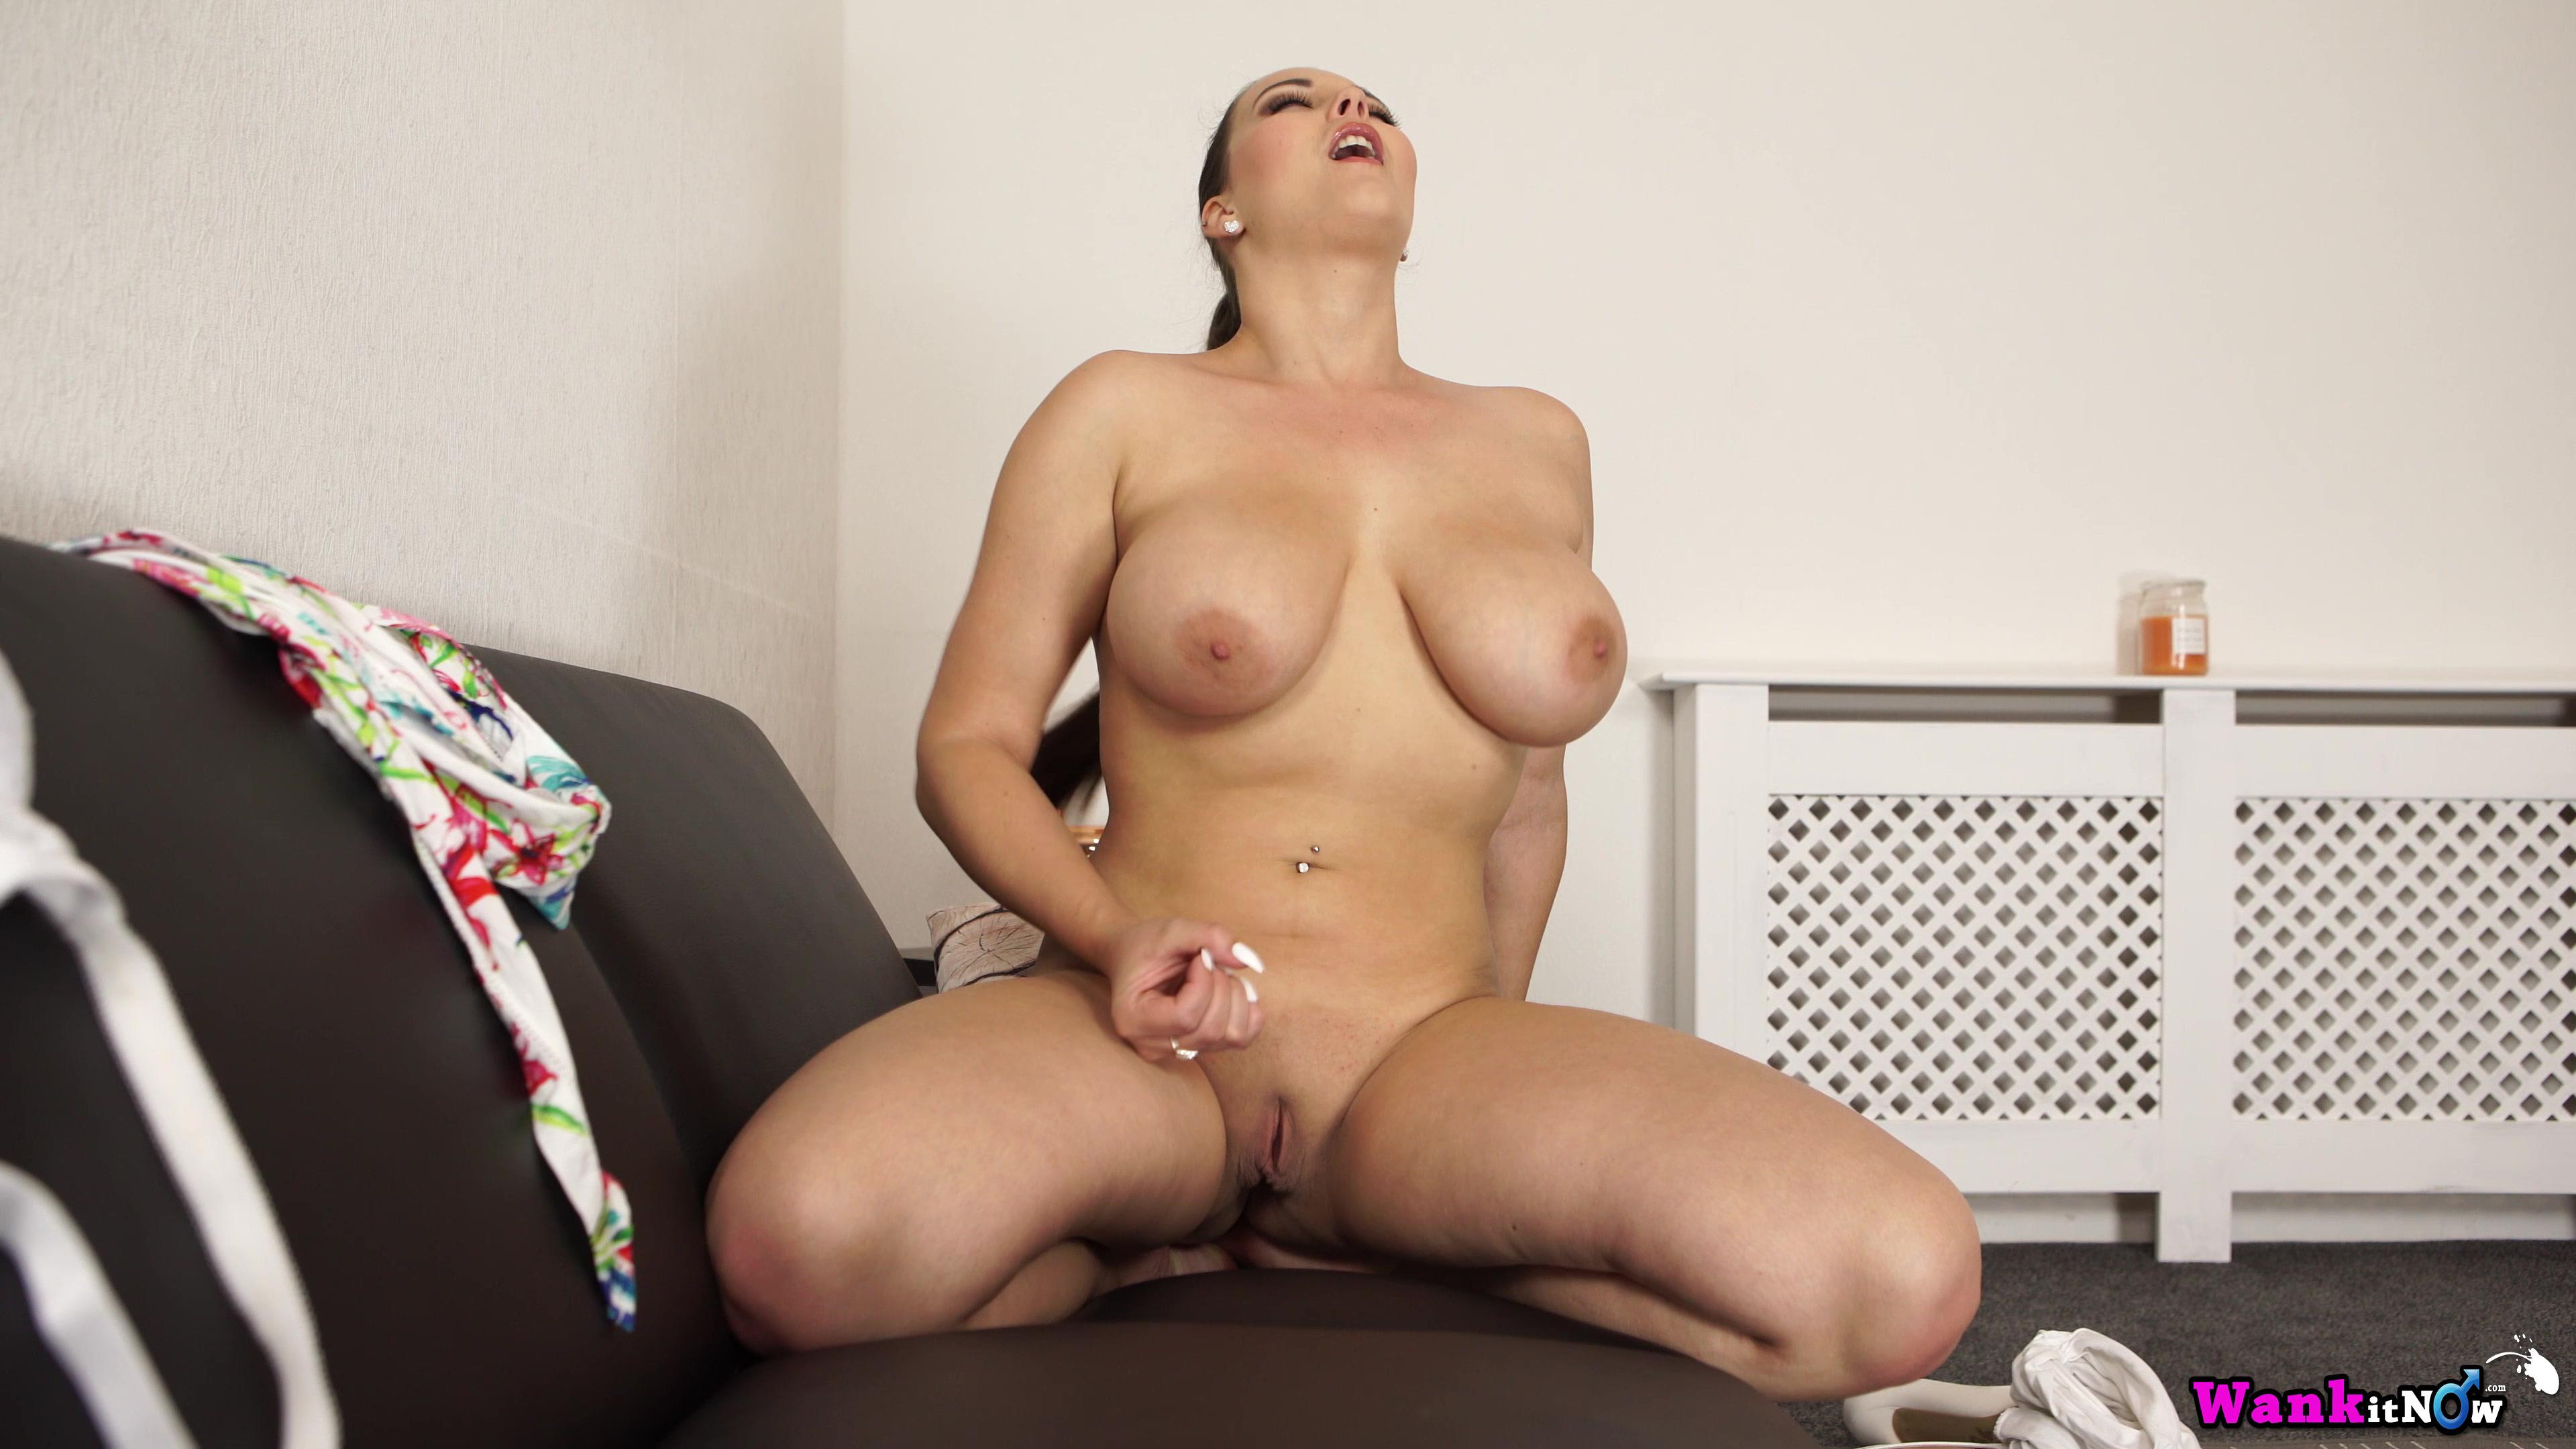 Mdds big tit hotwife naughty alysha railed by black dick